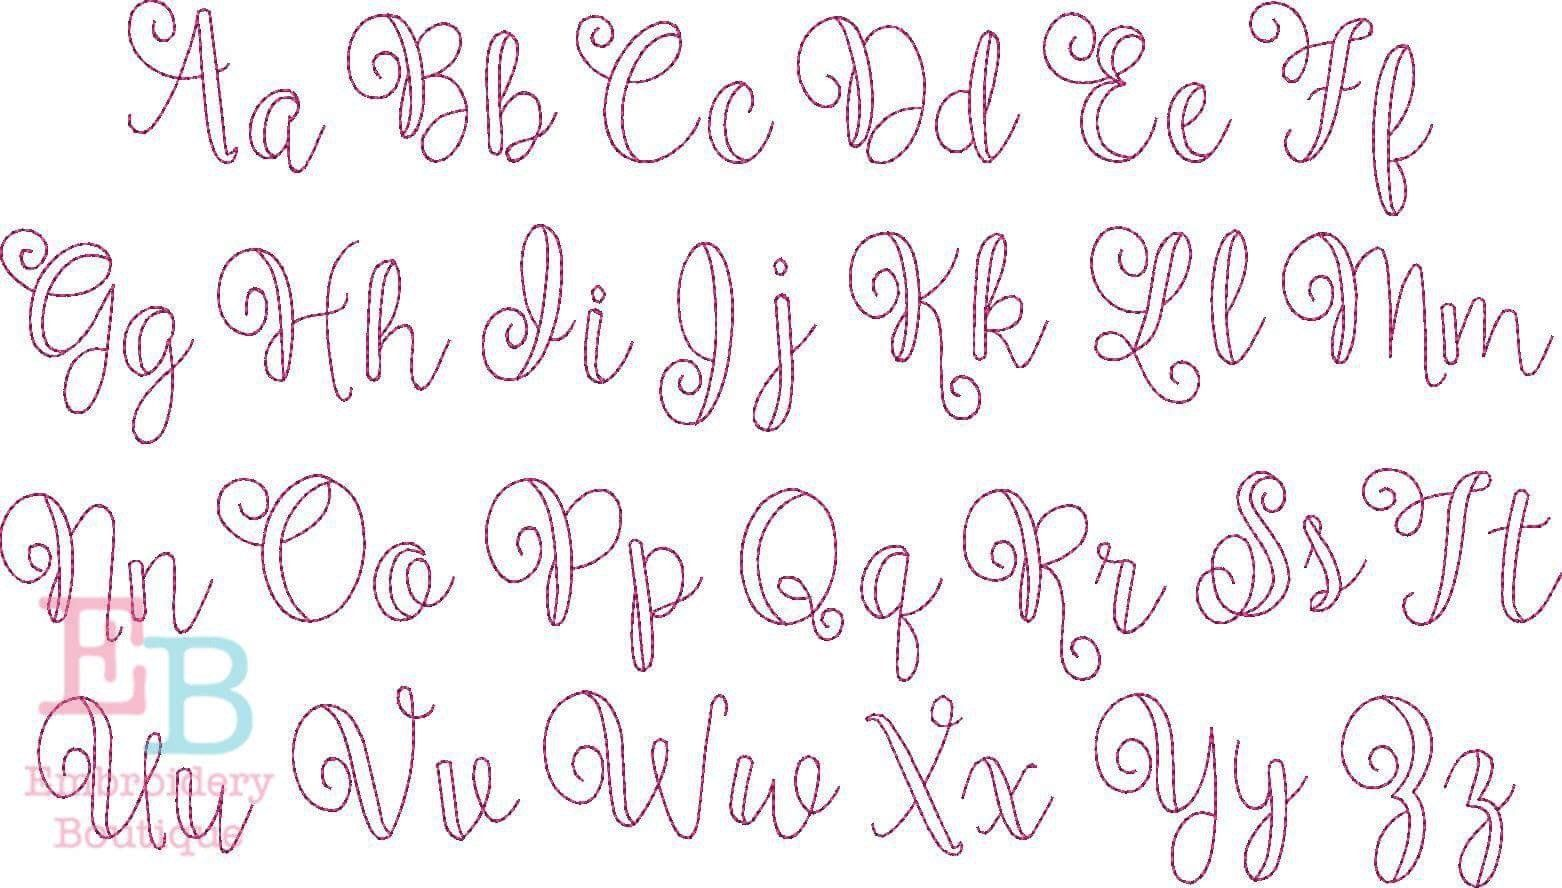 Ballerina Vintage Embroidery Font Script Fonts Alphabet Lettering Fonts Embroidery Boutique